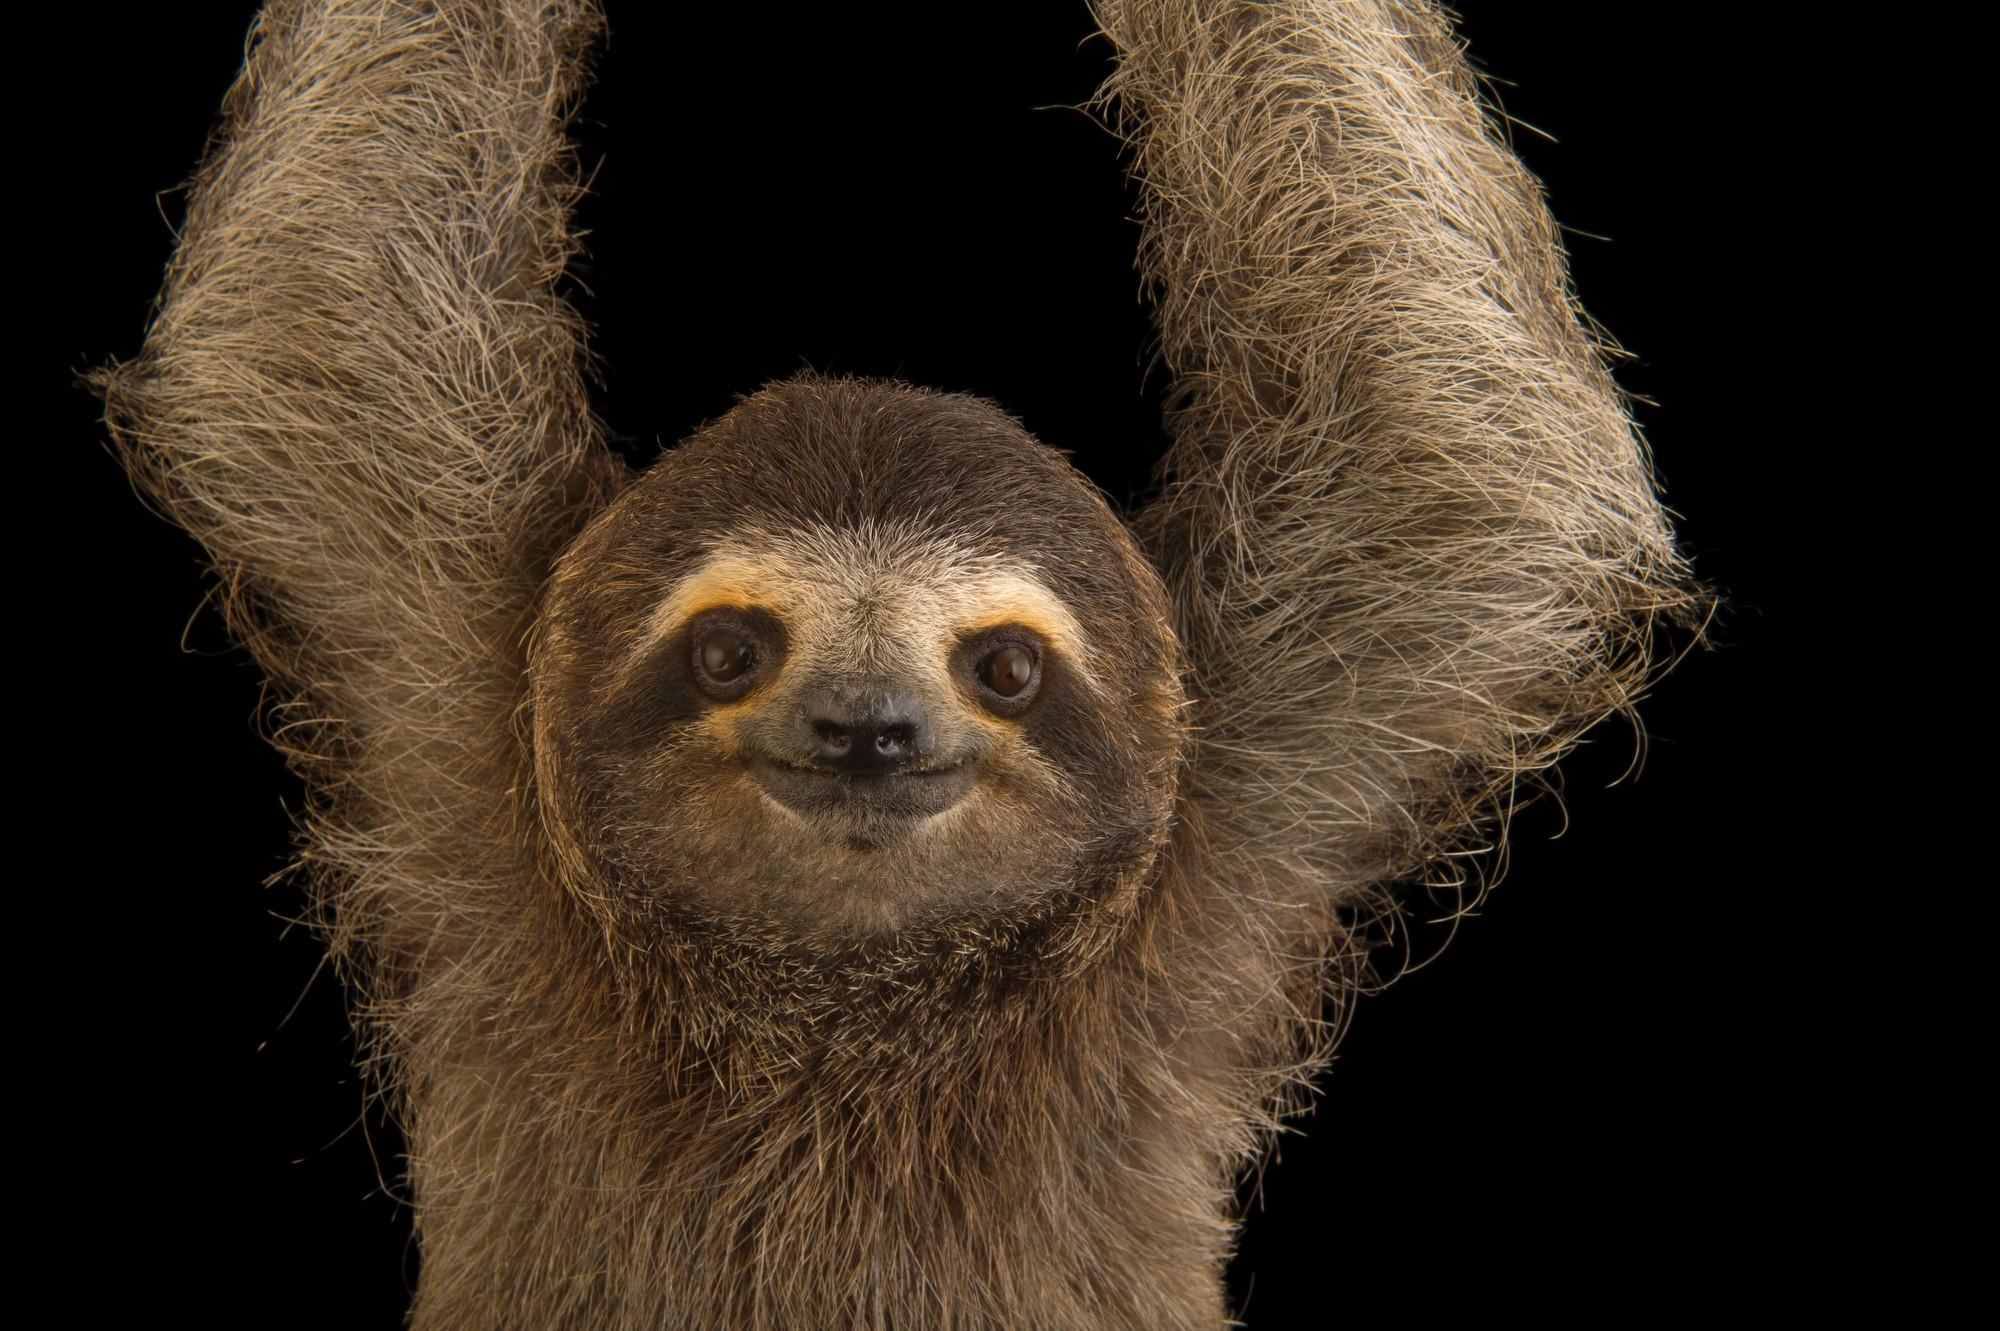 Ani062 00306 joel sartore - Sloth wallpaper phone ...